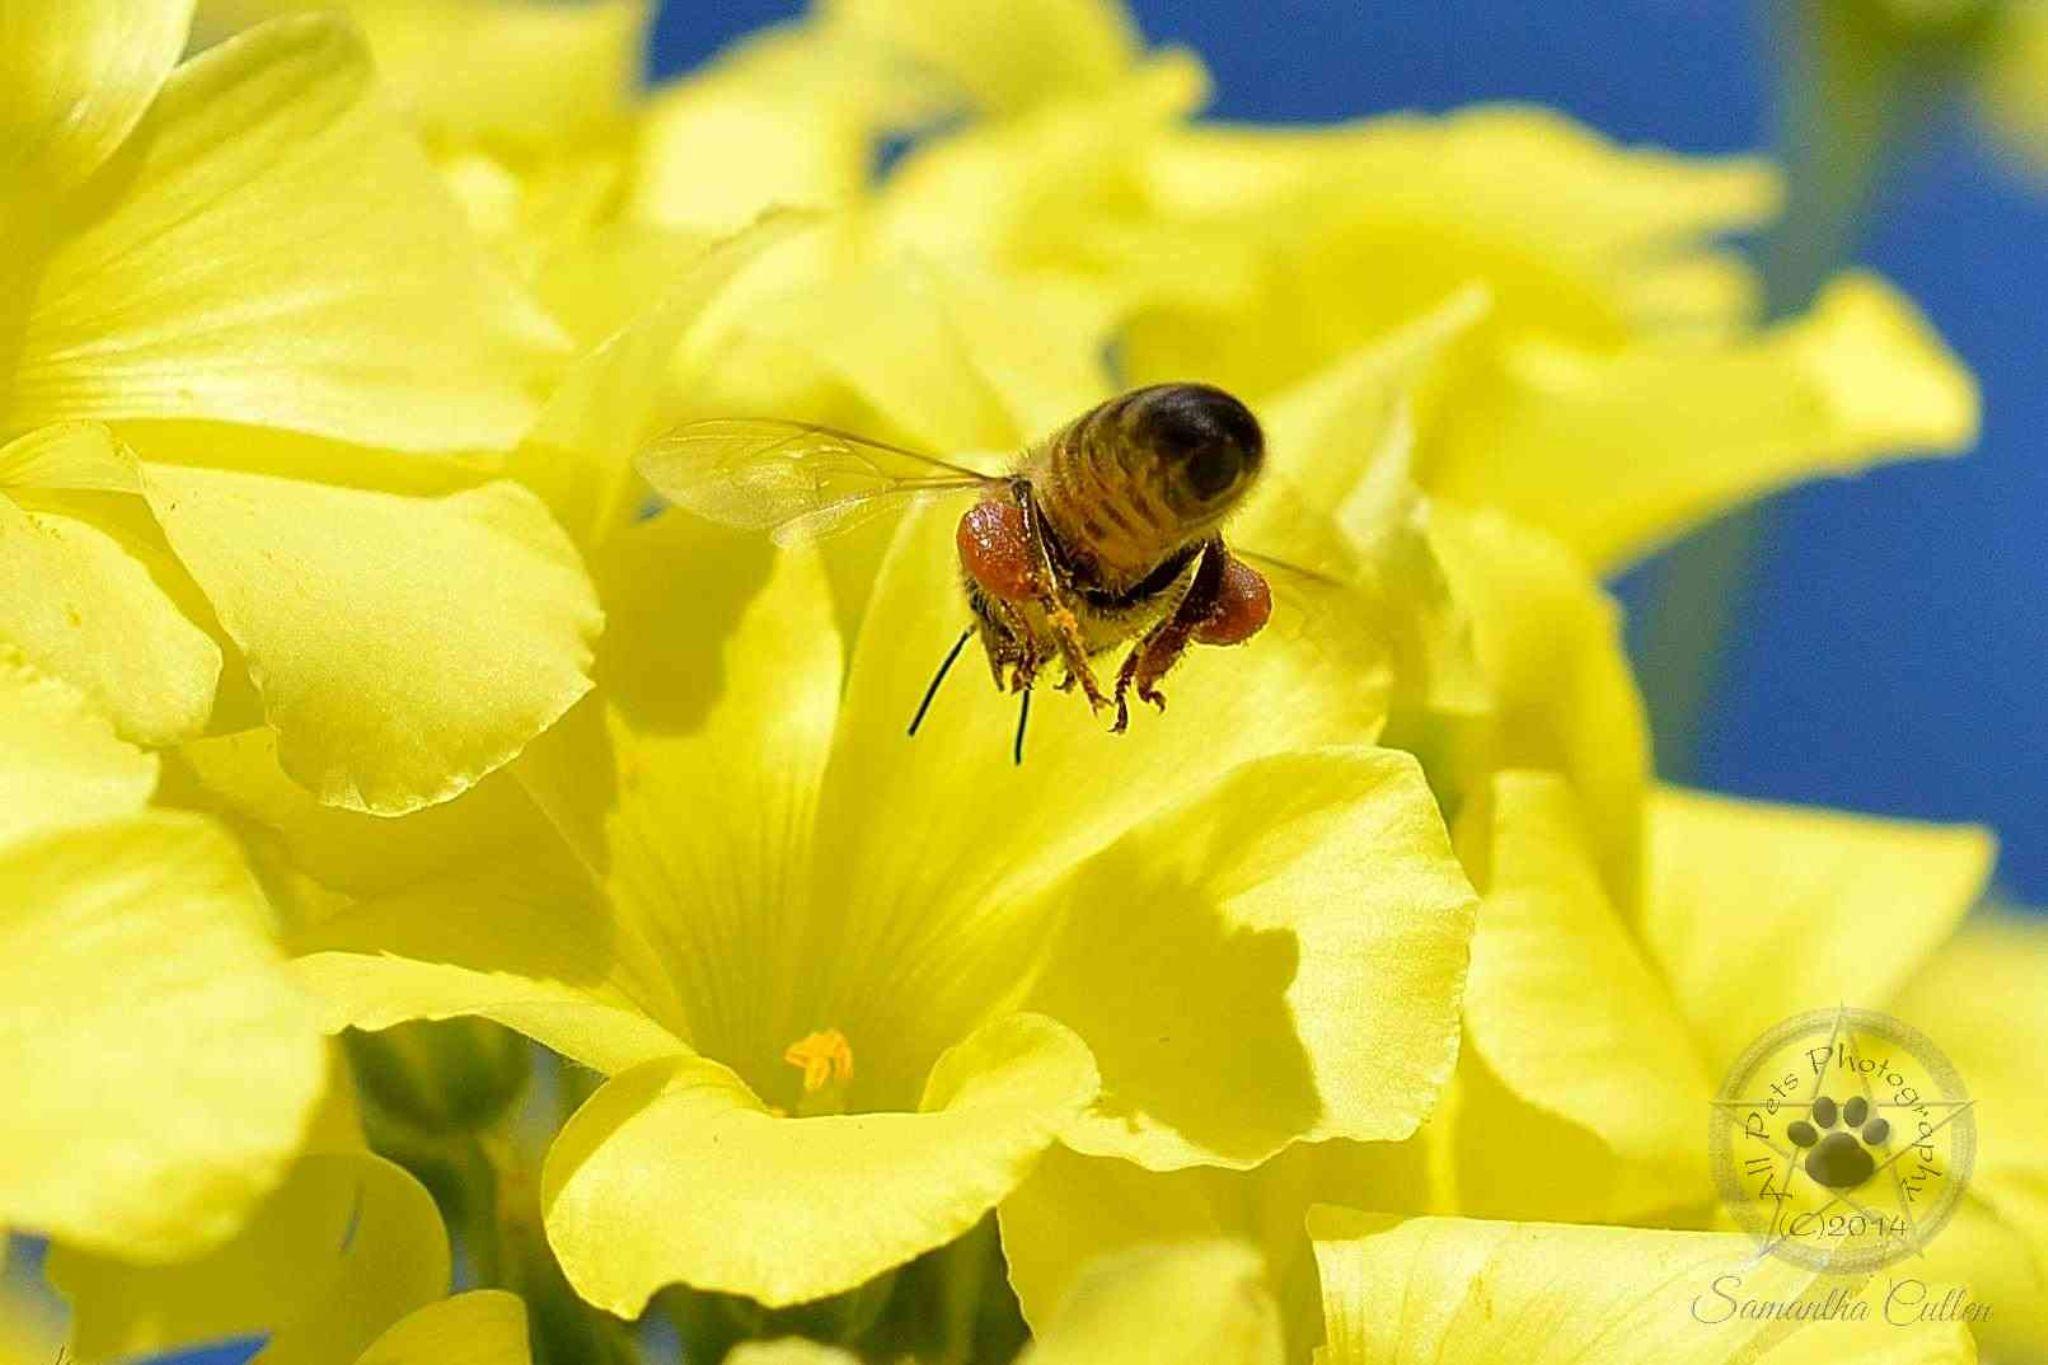 Bee by Samantha Cullen